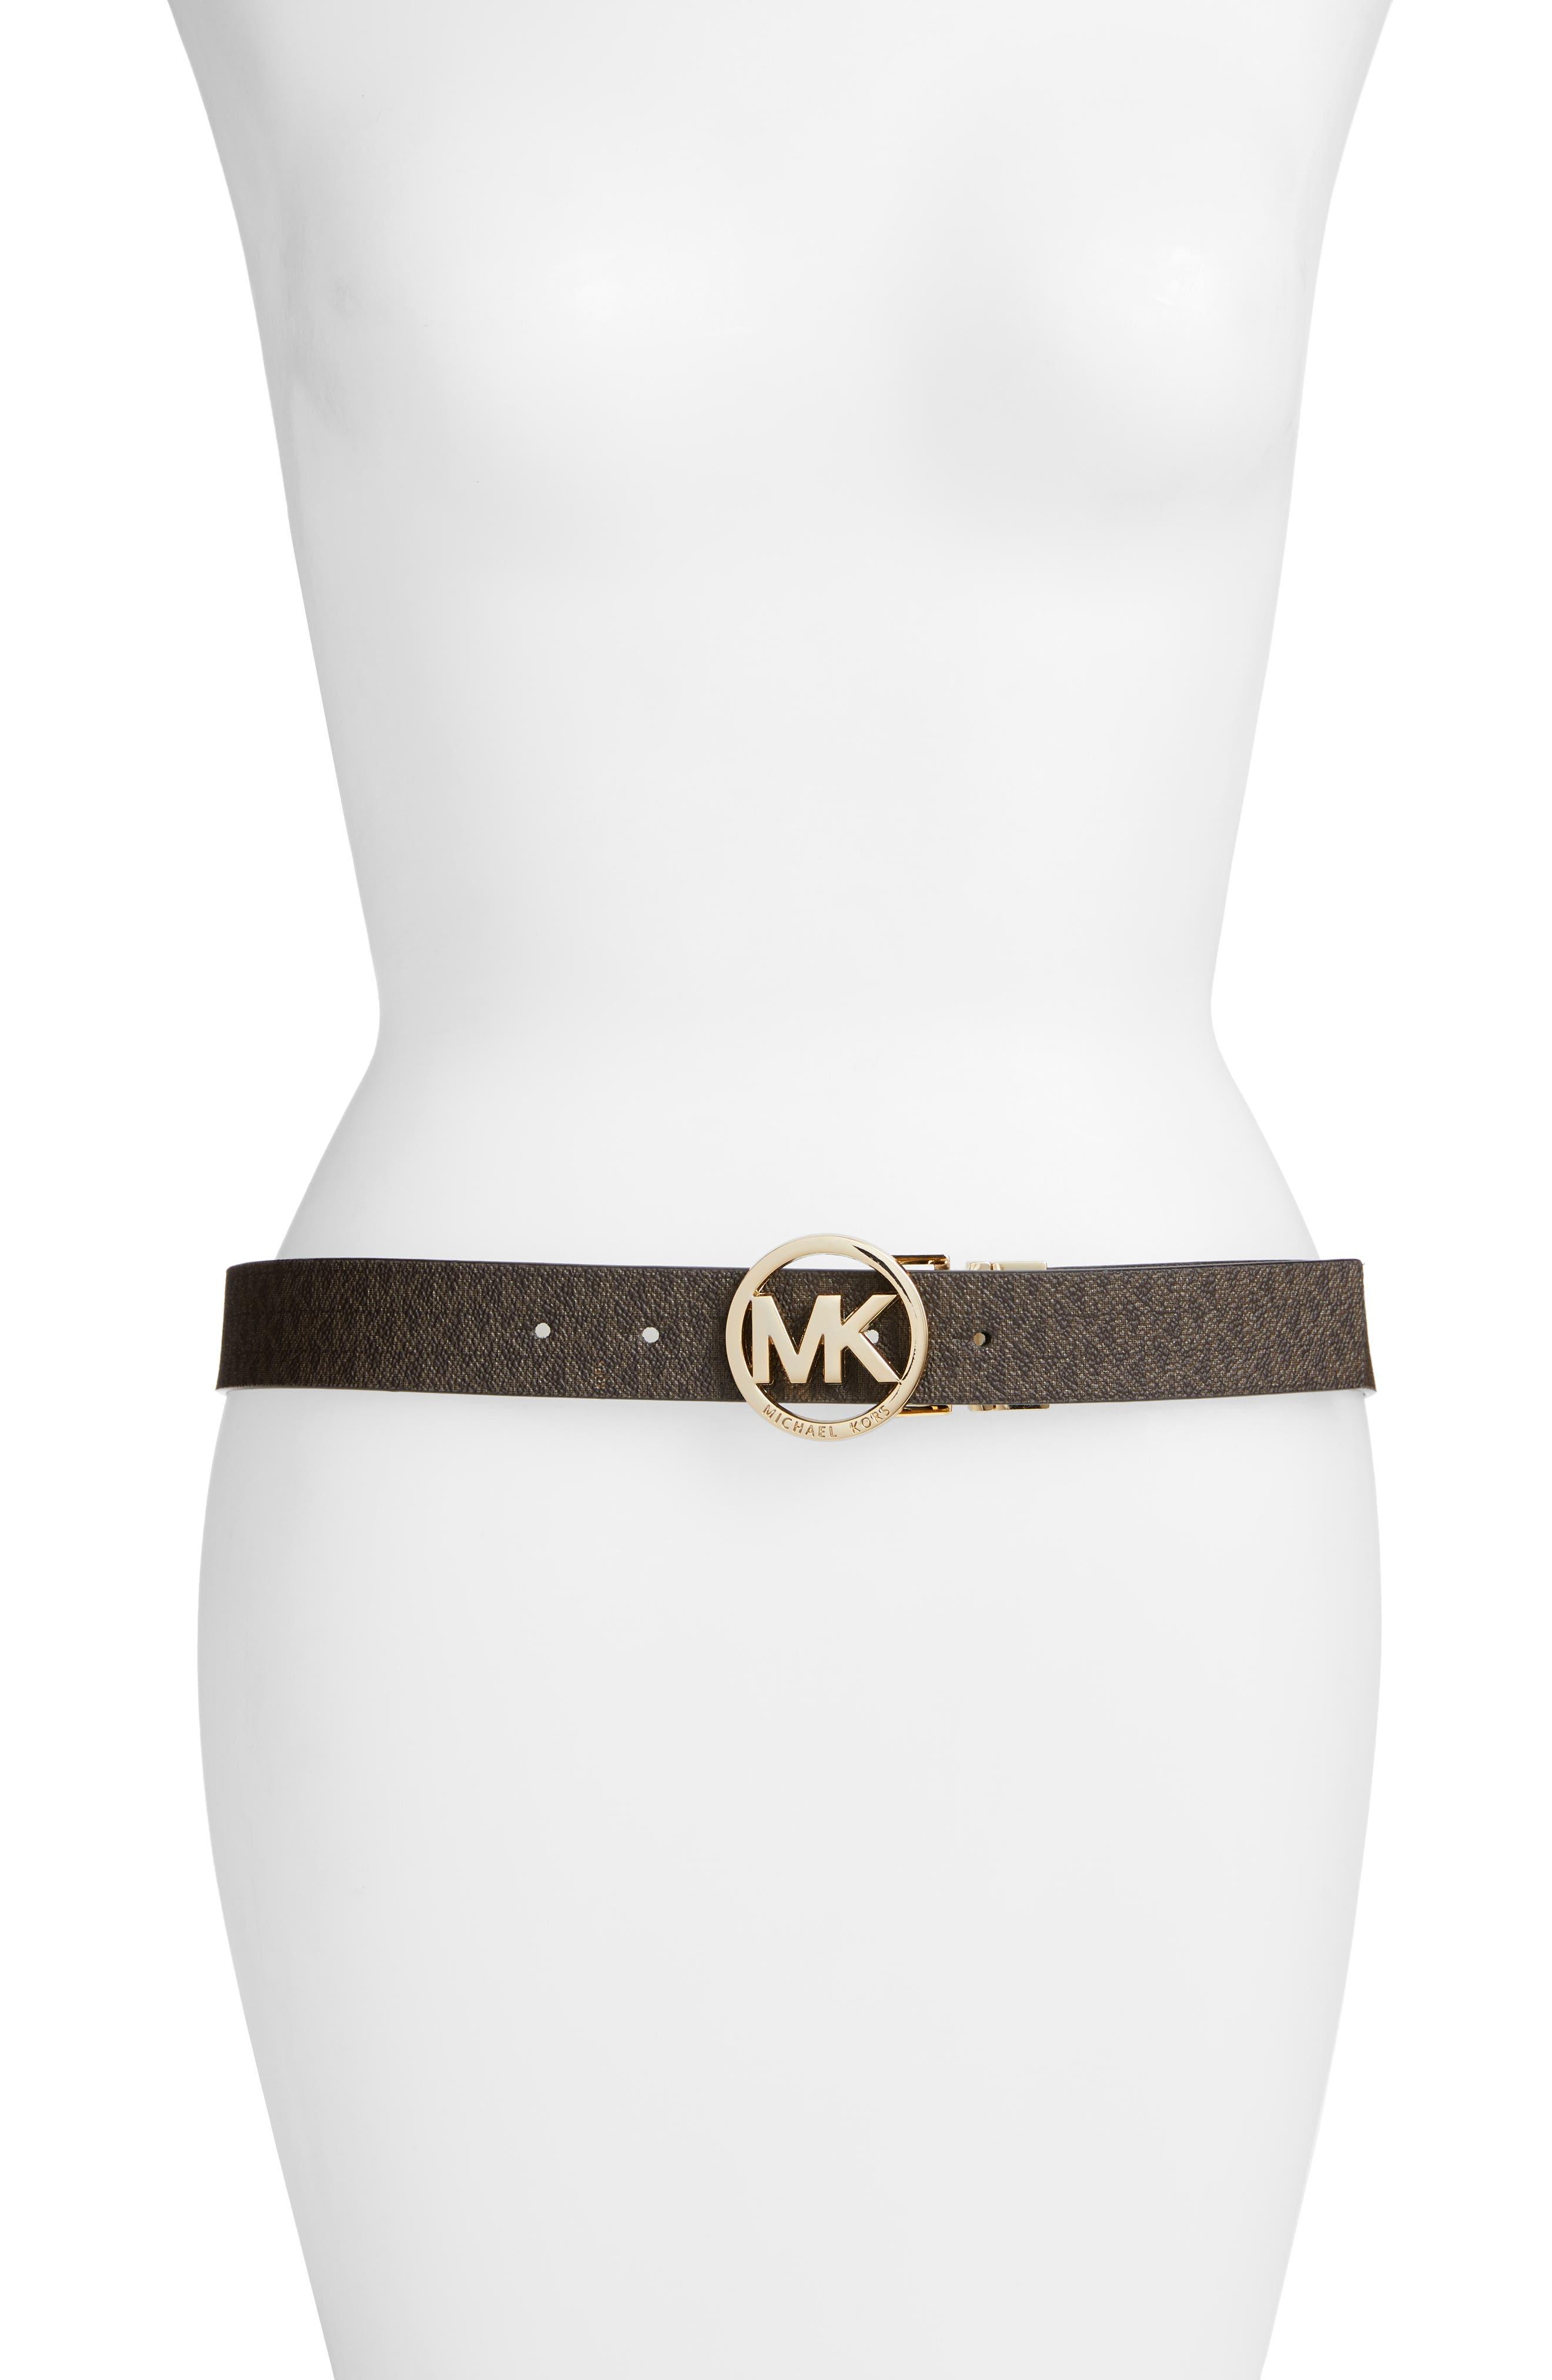 MICHAEL MICHAEL KORS, Logo Reversible Leather Belt, Main thumbnail 1, color, CHOCOLATE/ BLACK